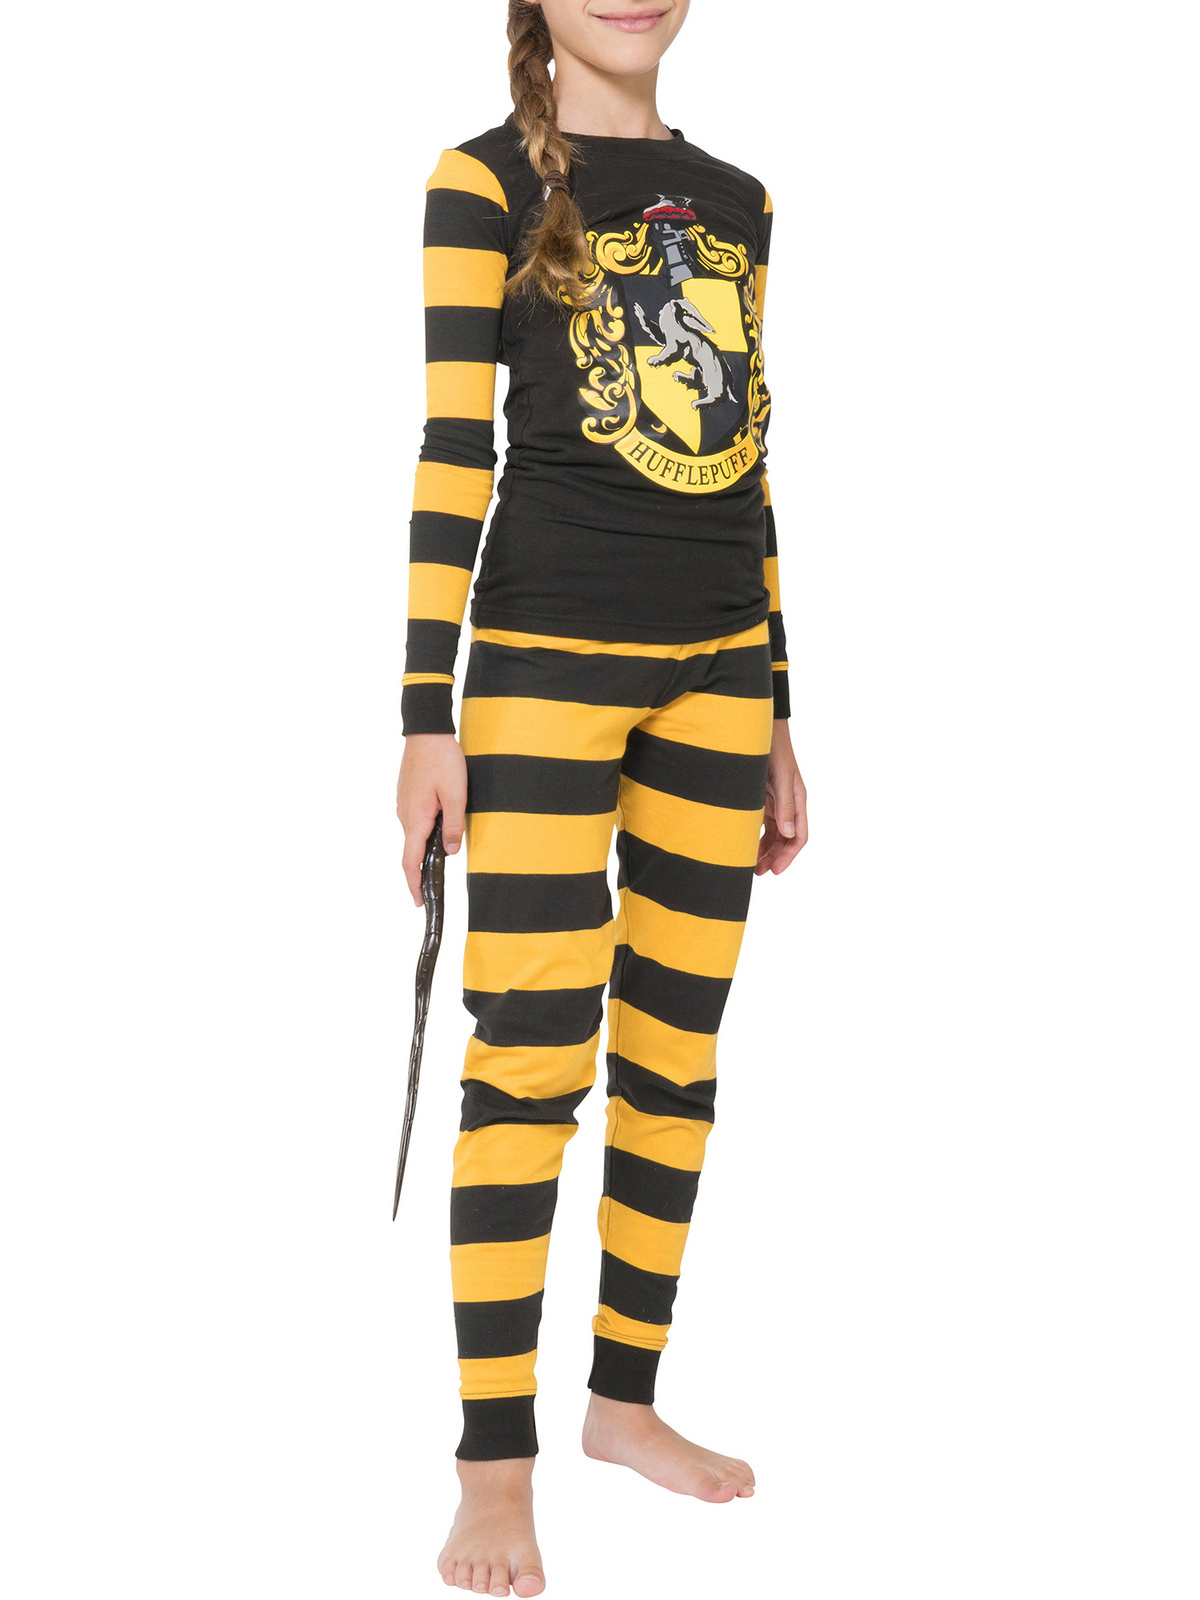 Harry Potter Hufflepuff 2 Piece Pajama Set (Boys & Girls)